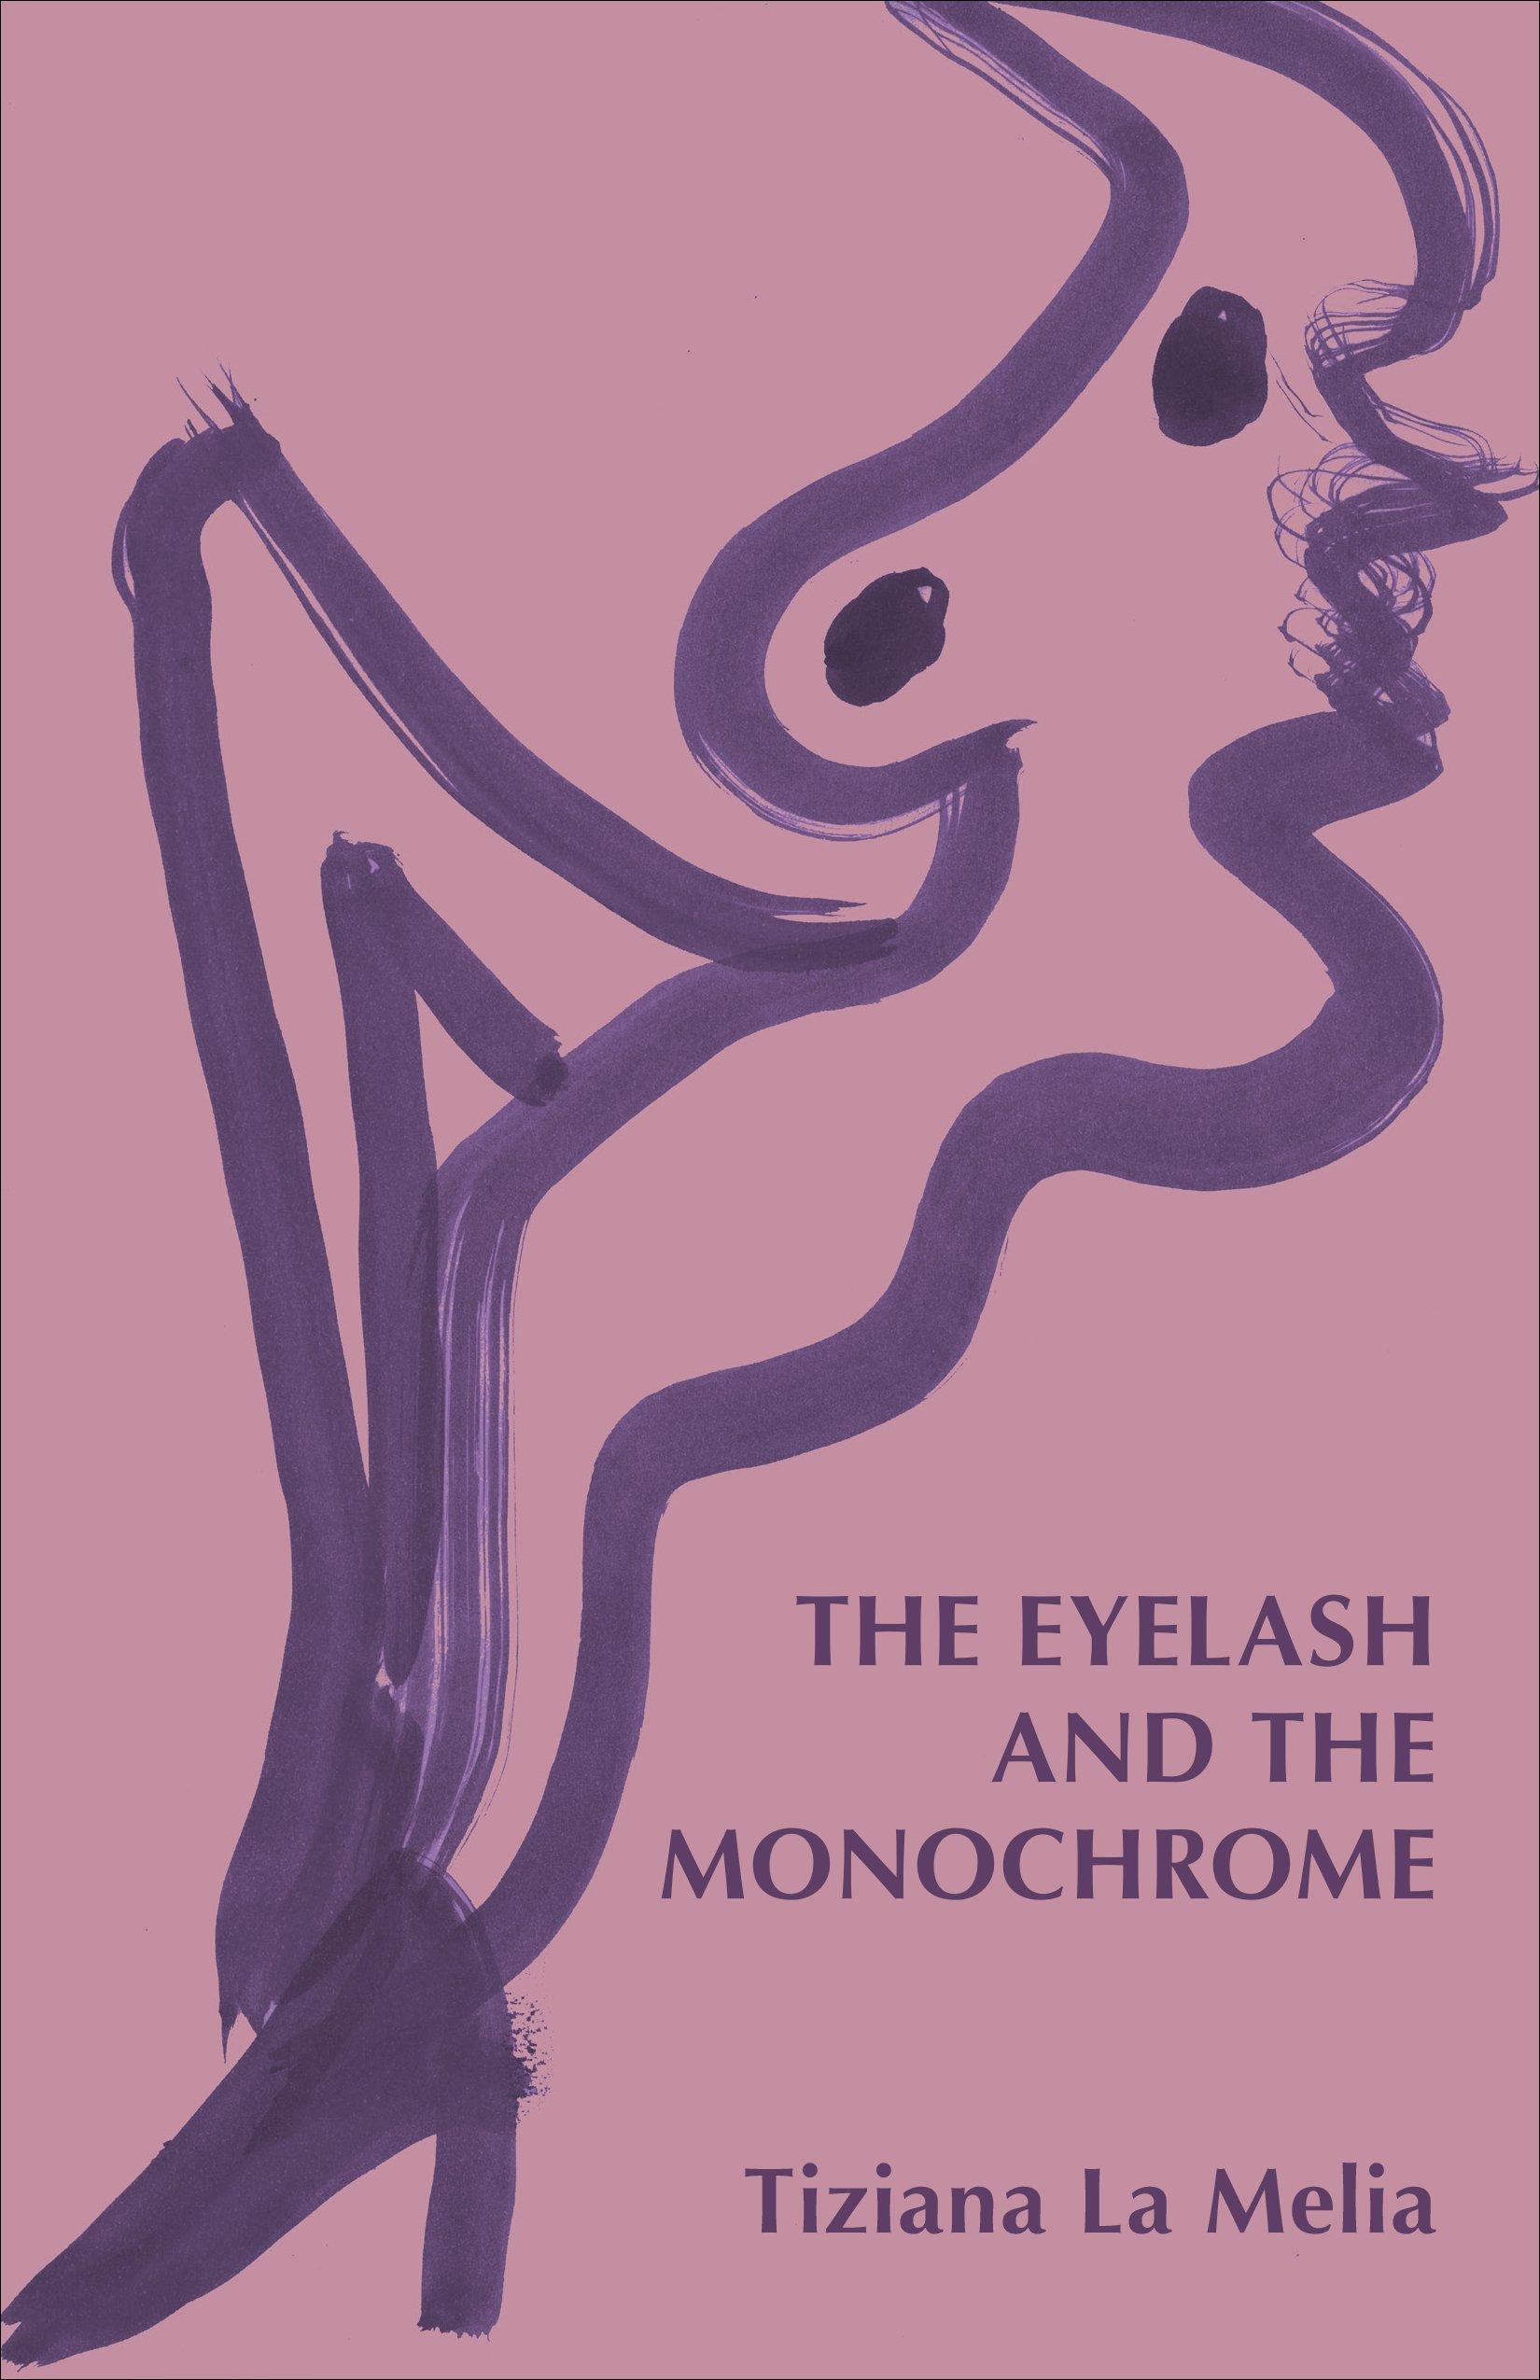 The Eyelash and the Monochrome, La Melia, Tiziana